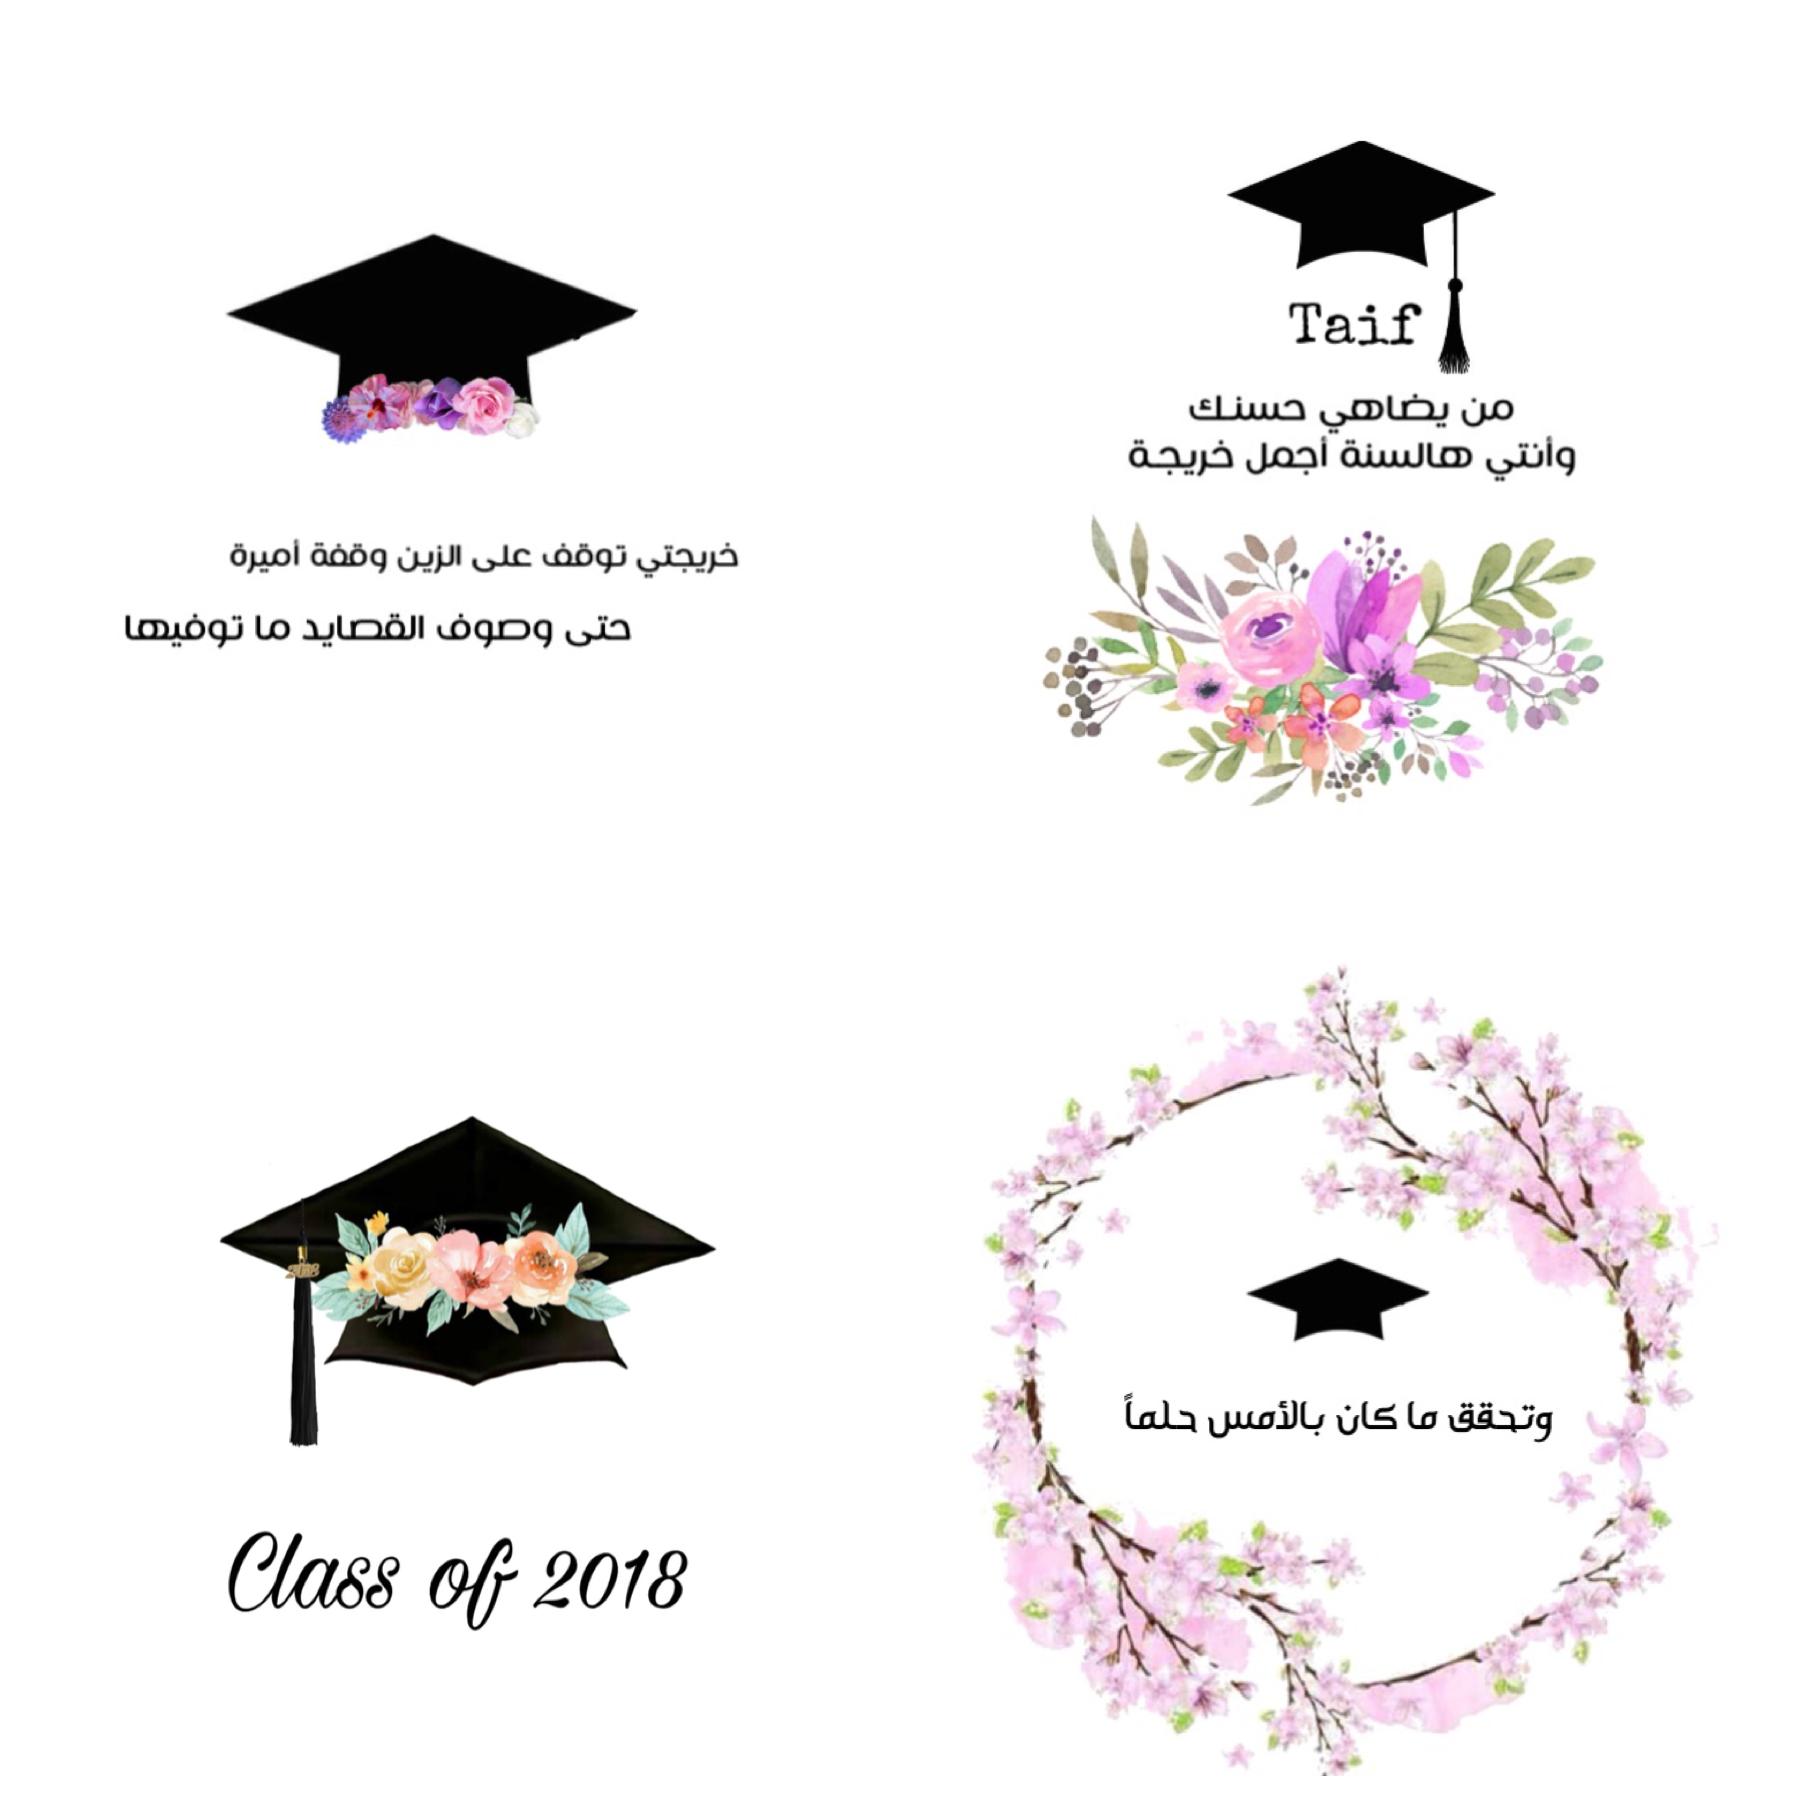 Pin By خلود خوخة On تخرج Graduation Wallpaper Graduation Cards Graduation Stickers